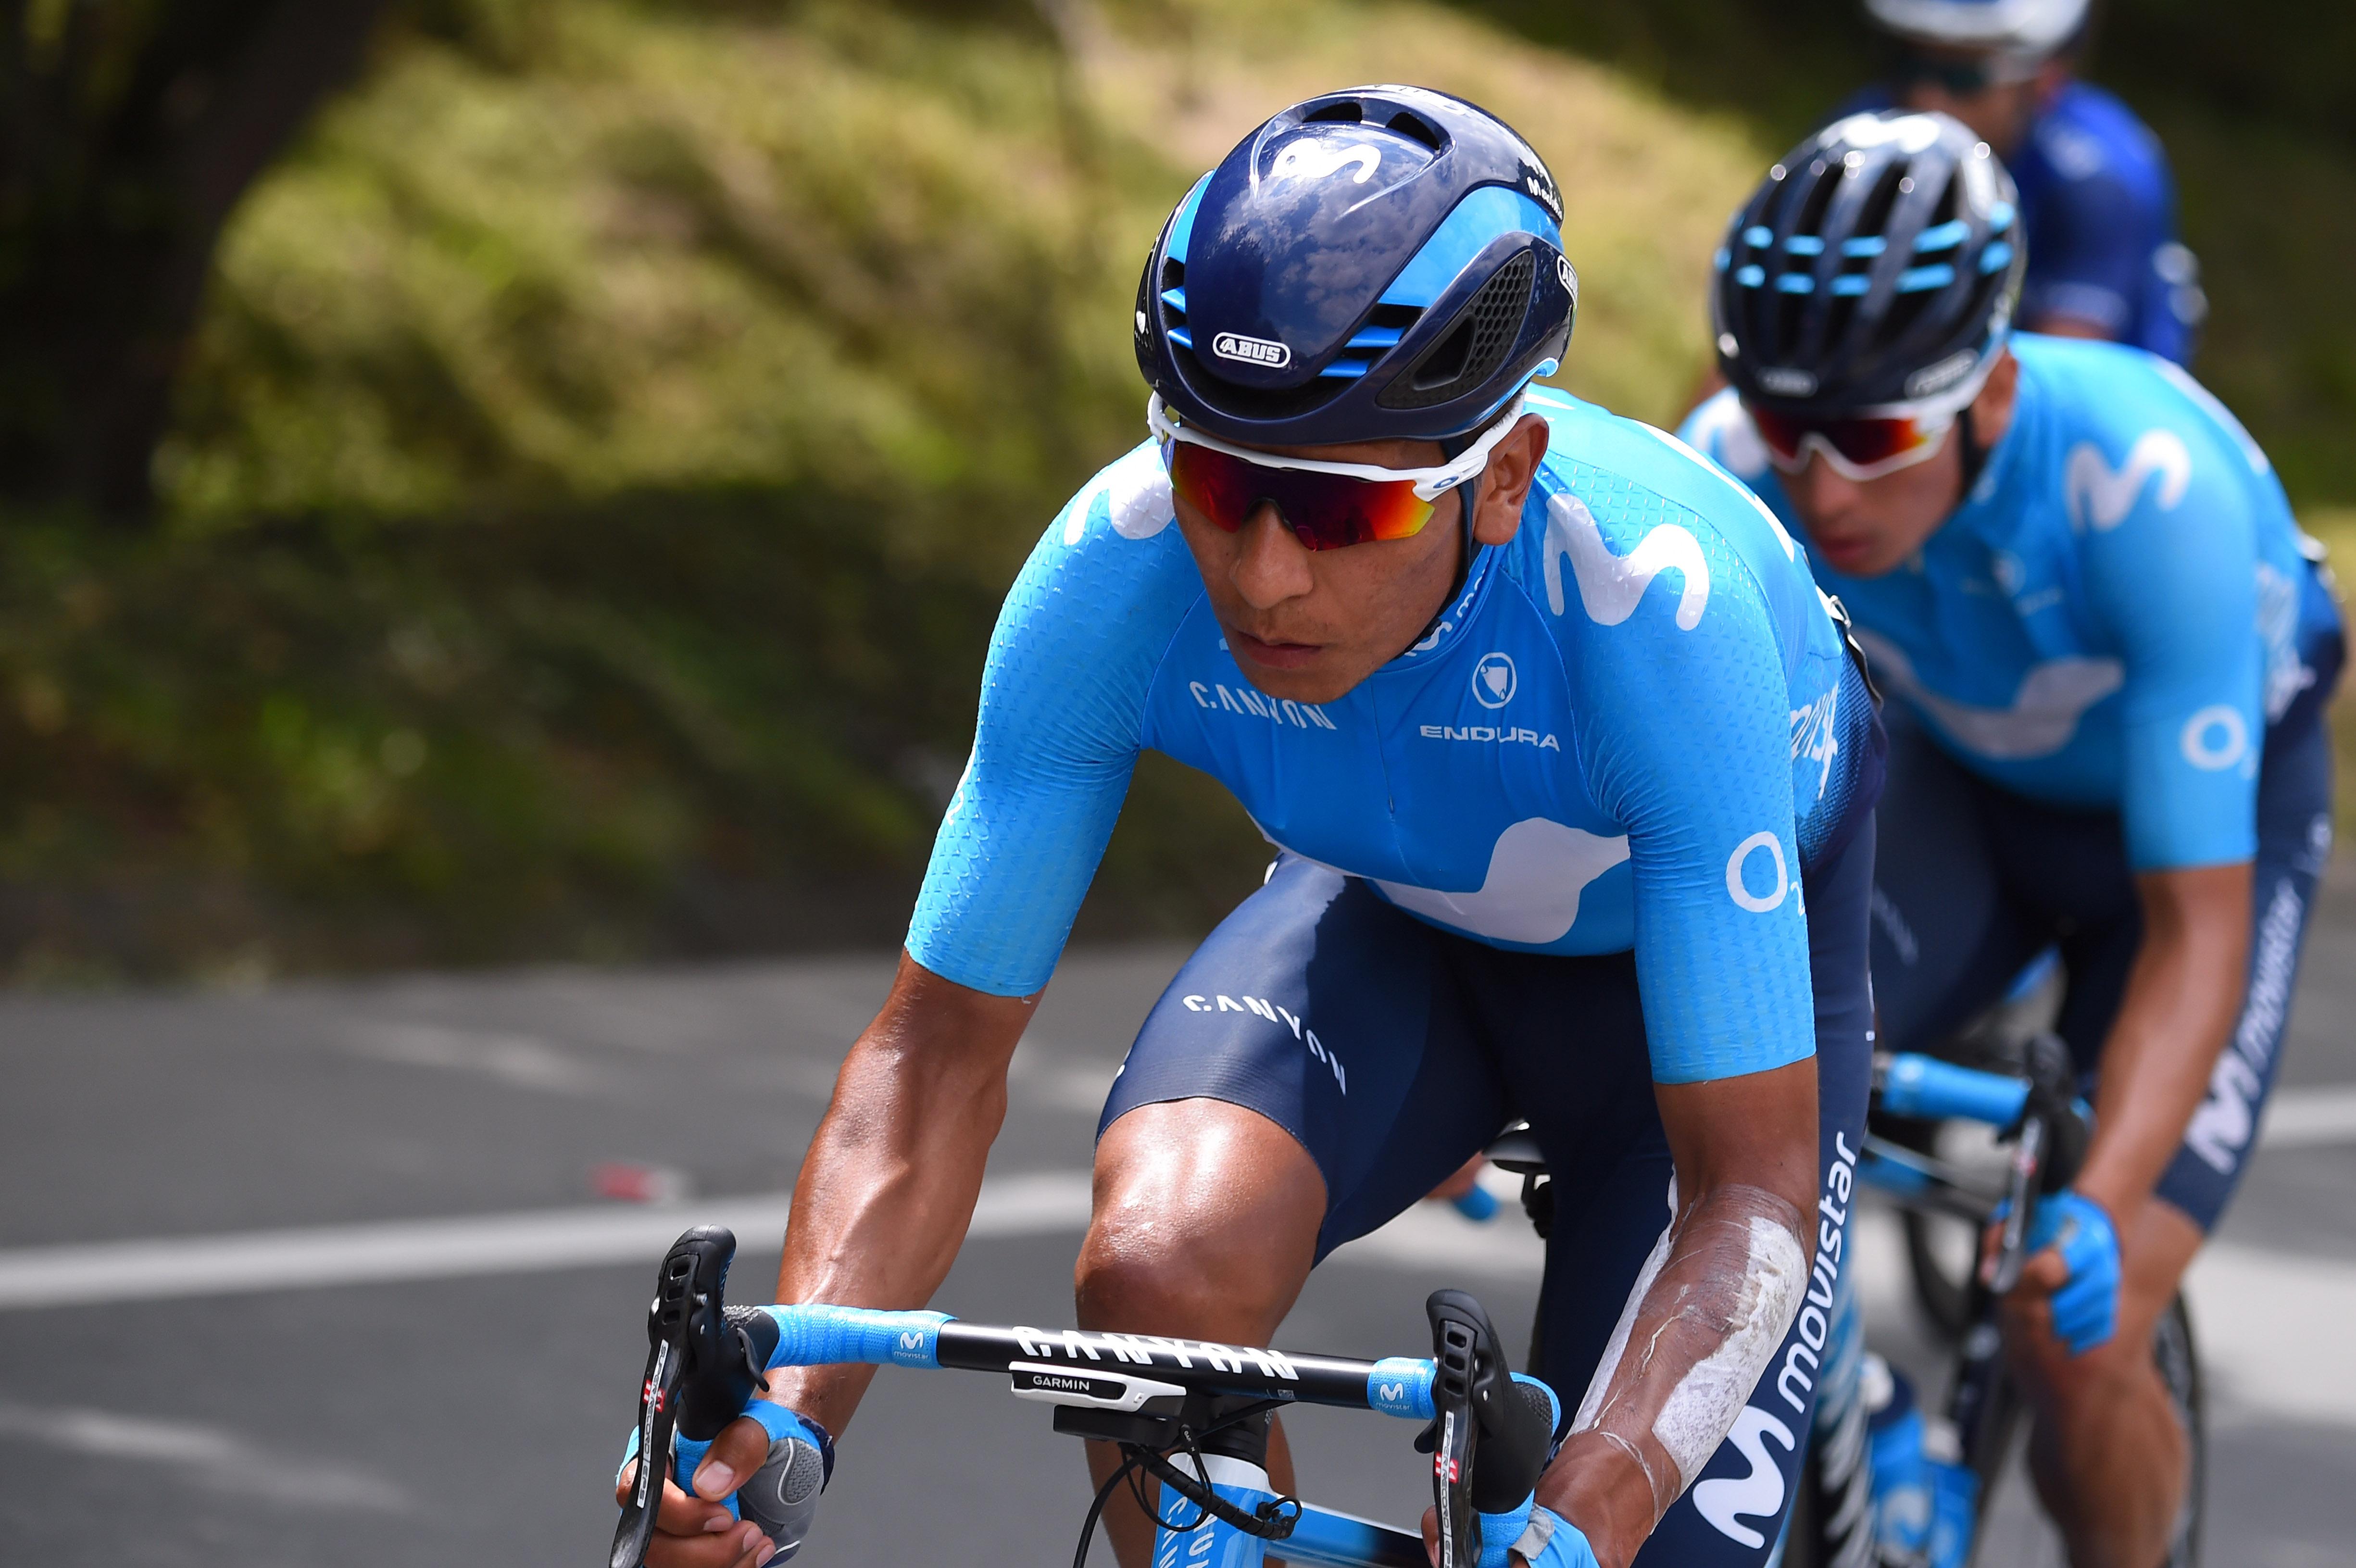 Nairo Quintana  afronta la temporada con el Tour como máximo objetivo.